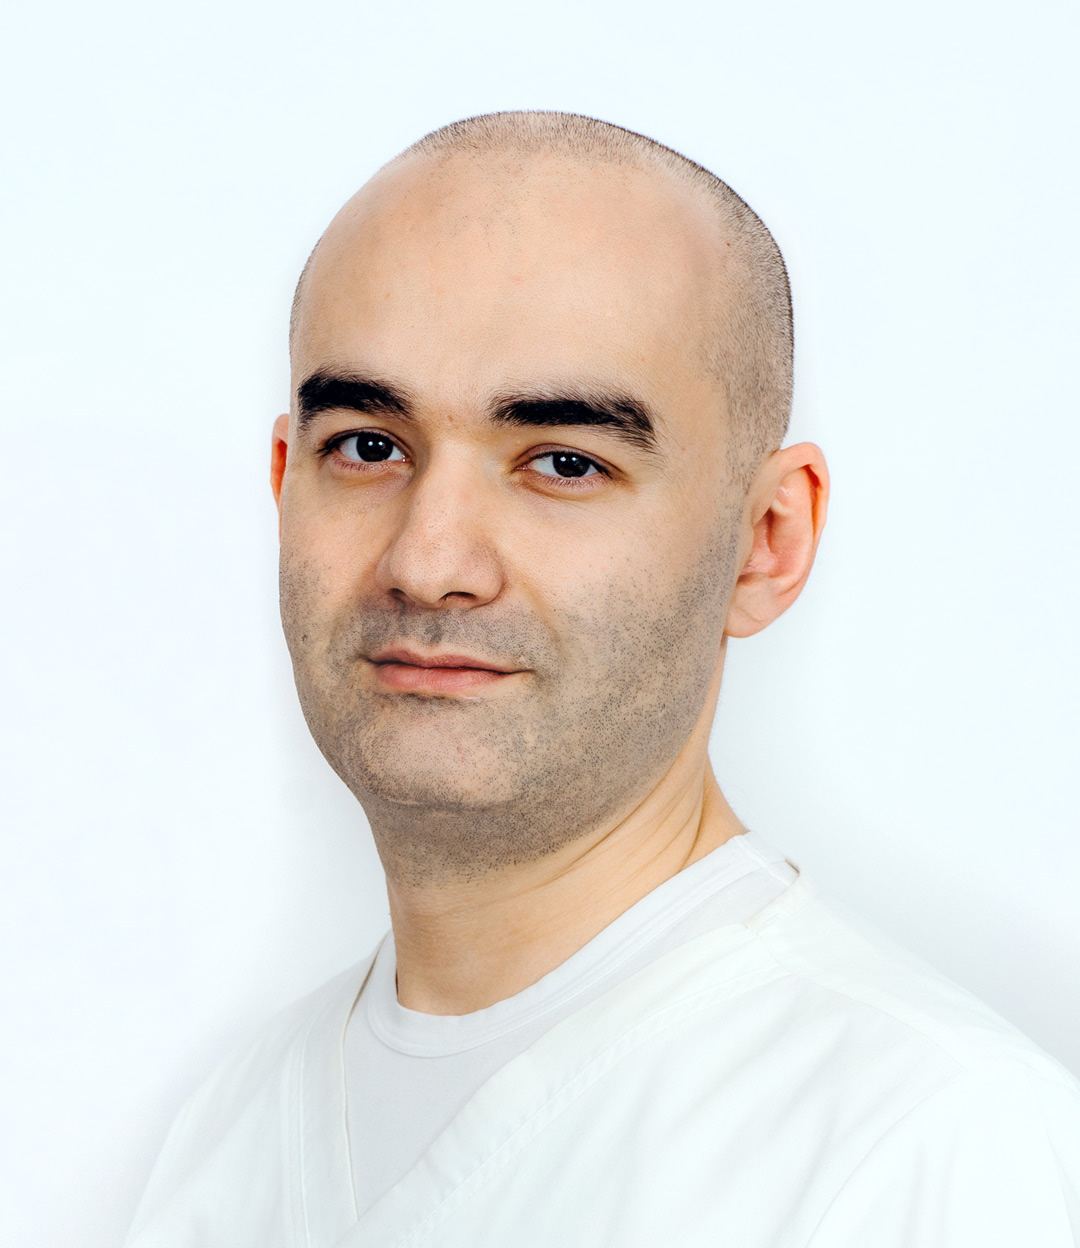 Чомаев Расул Алиевич